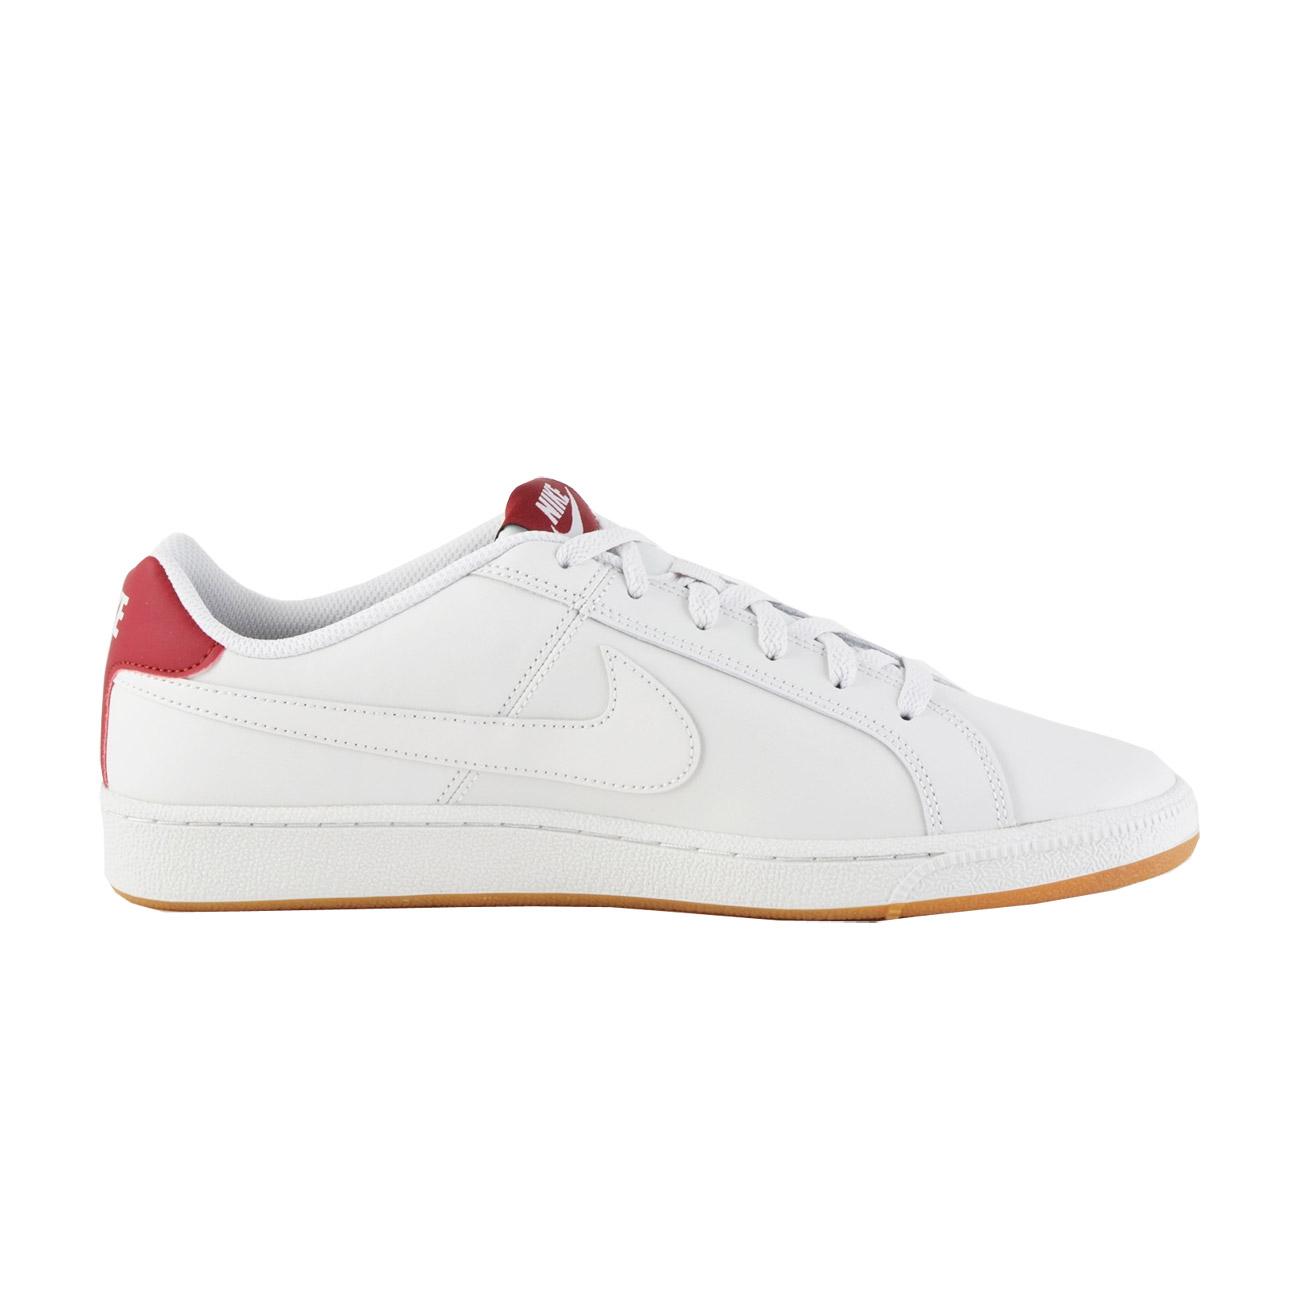 premium selection 245e0 cf85b Nike Mens Court Royal Heritage Trainer Platinum Tint